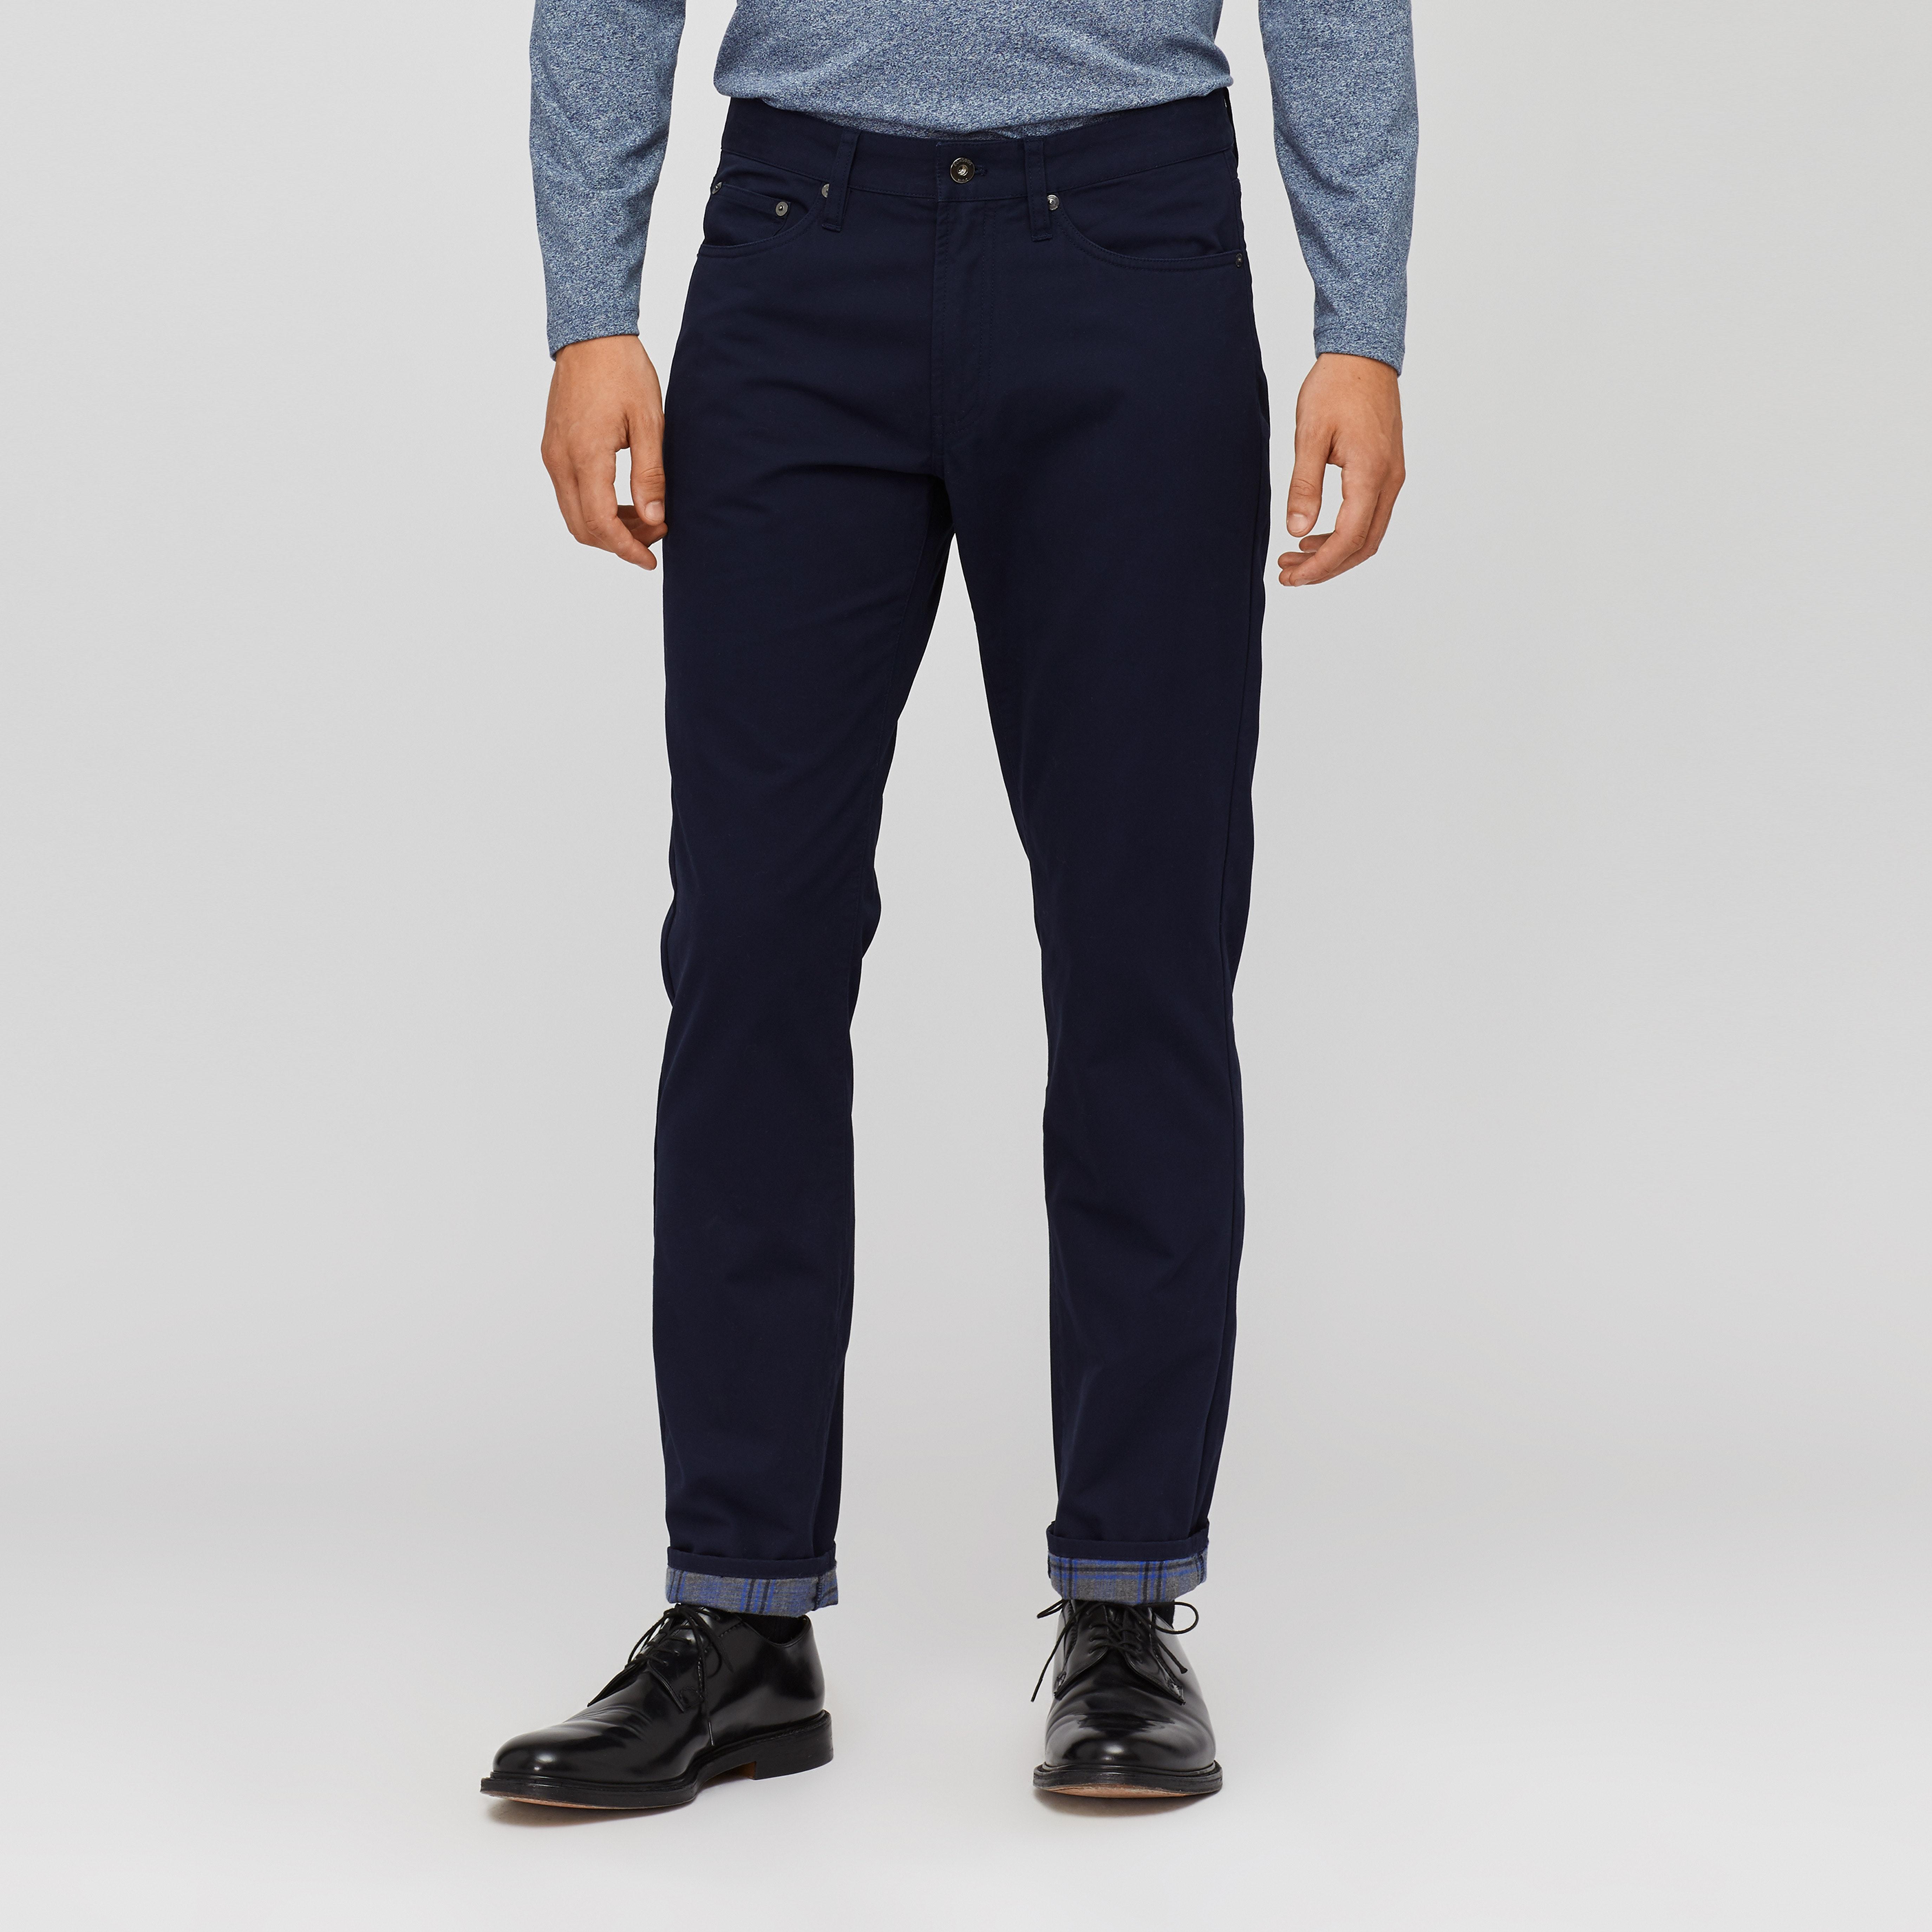 Flannel Lined 5-Pocket Pants